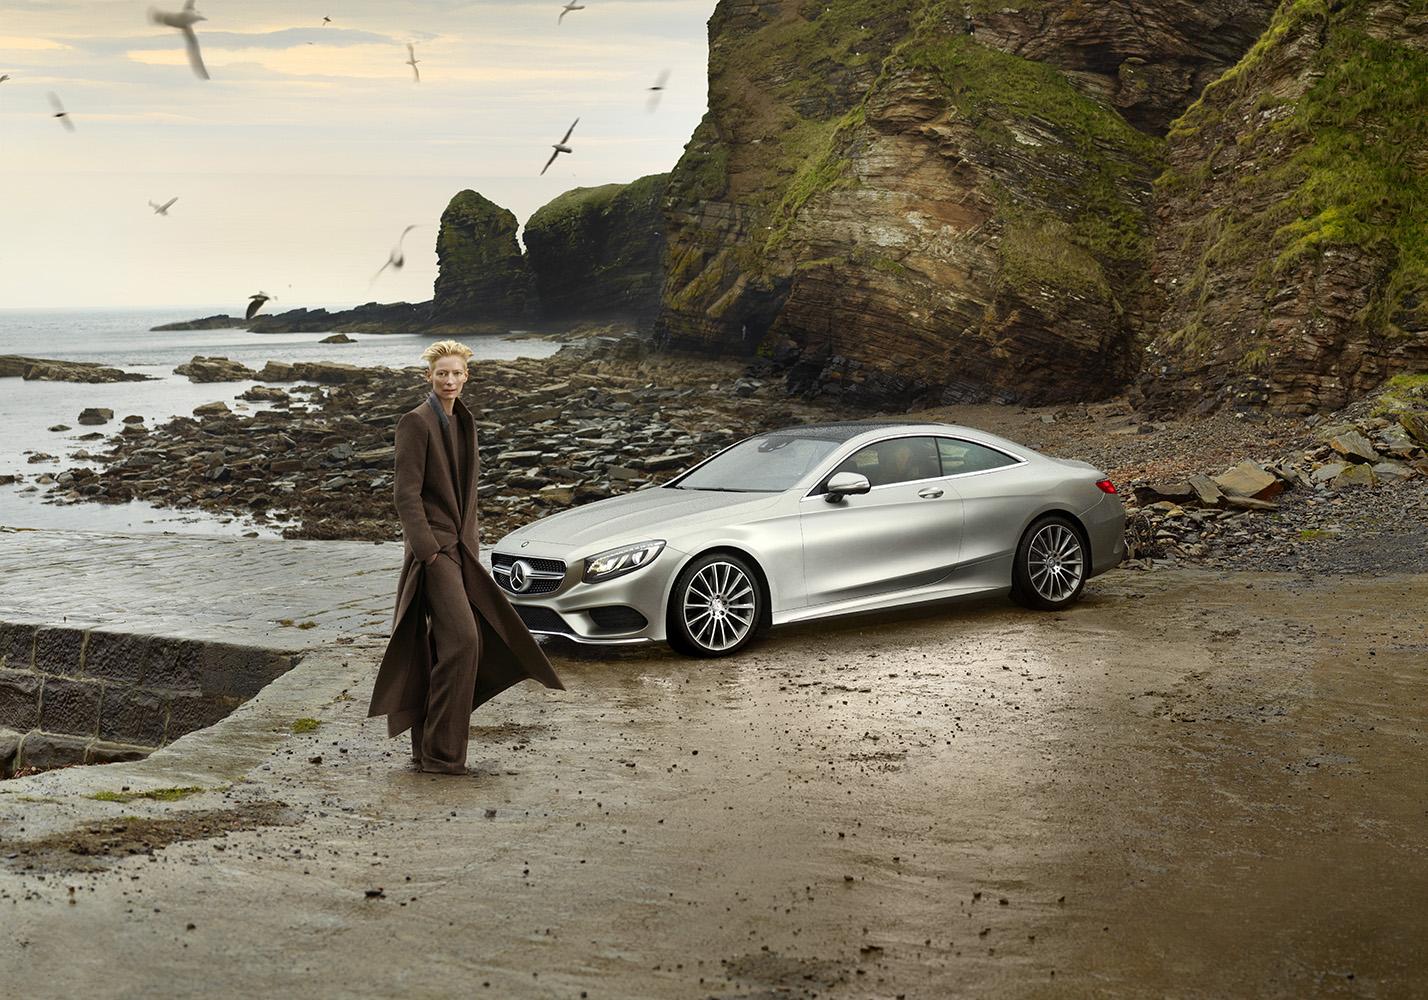 Mercedes SS15 by Roe Ethridge